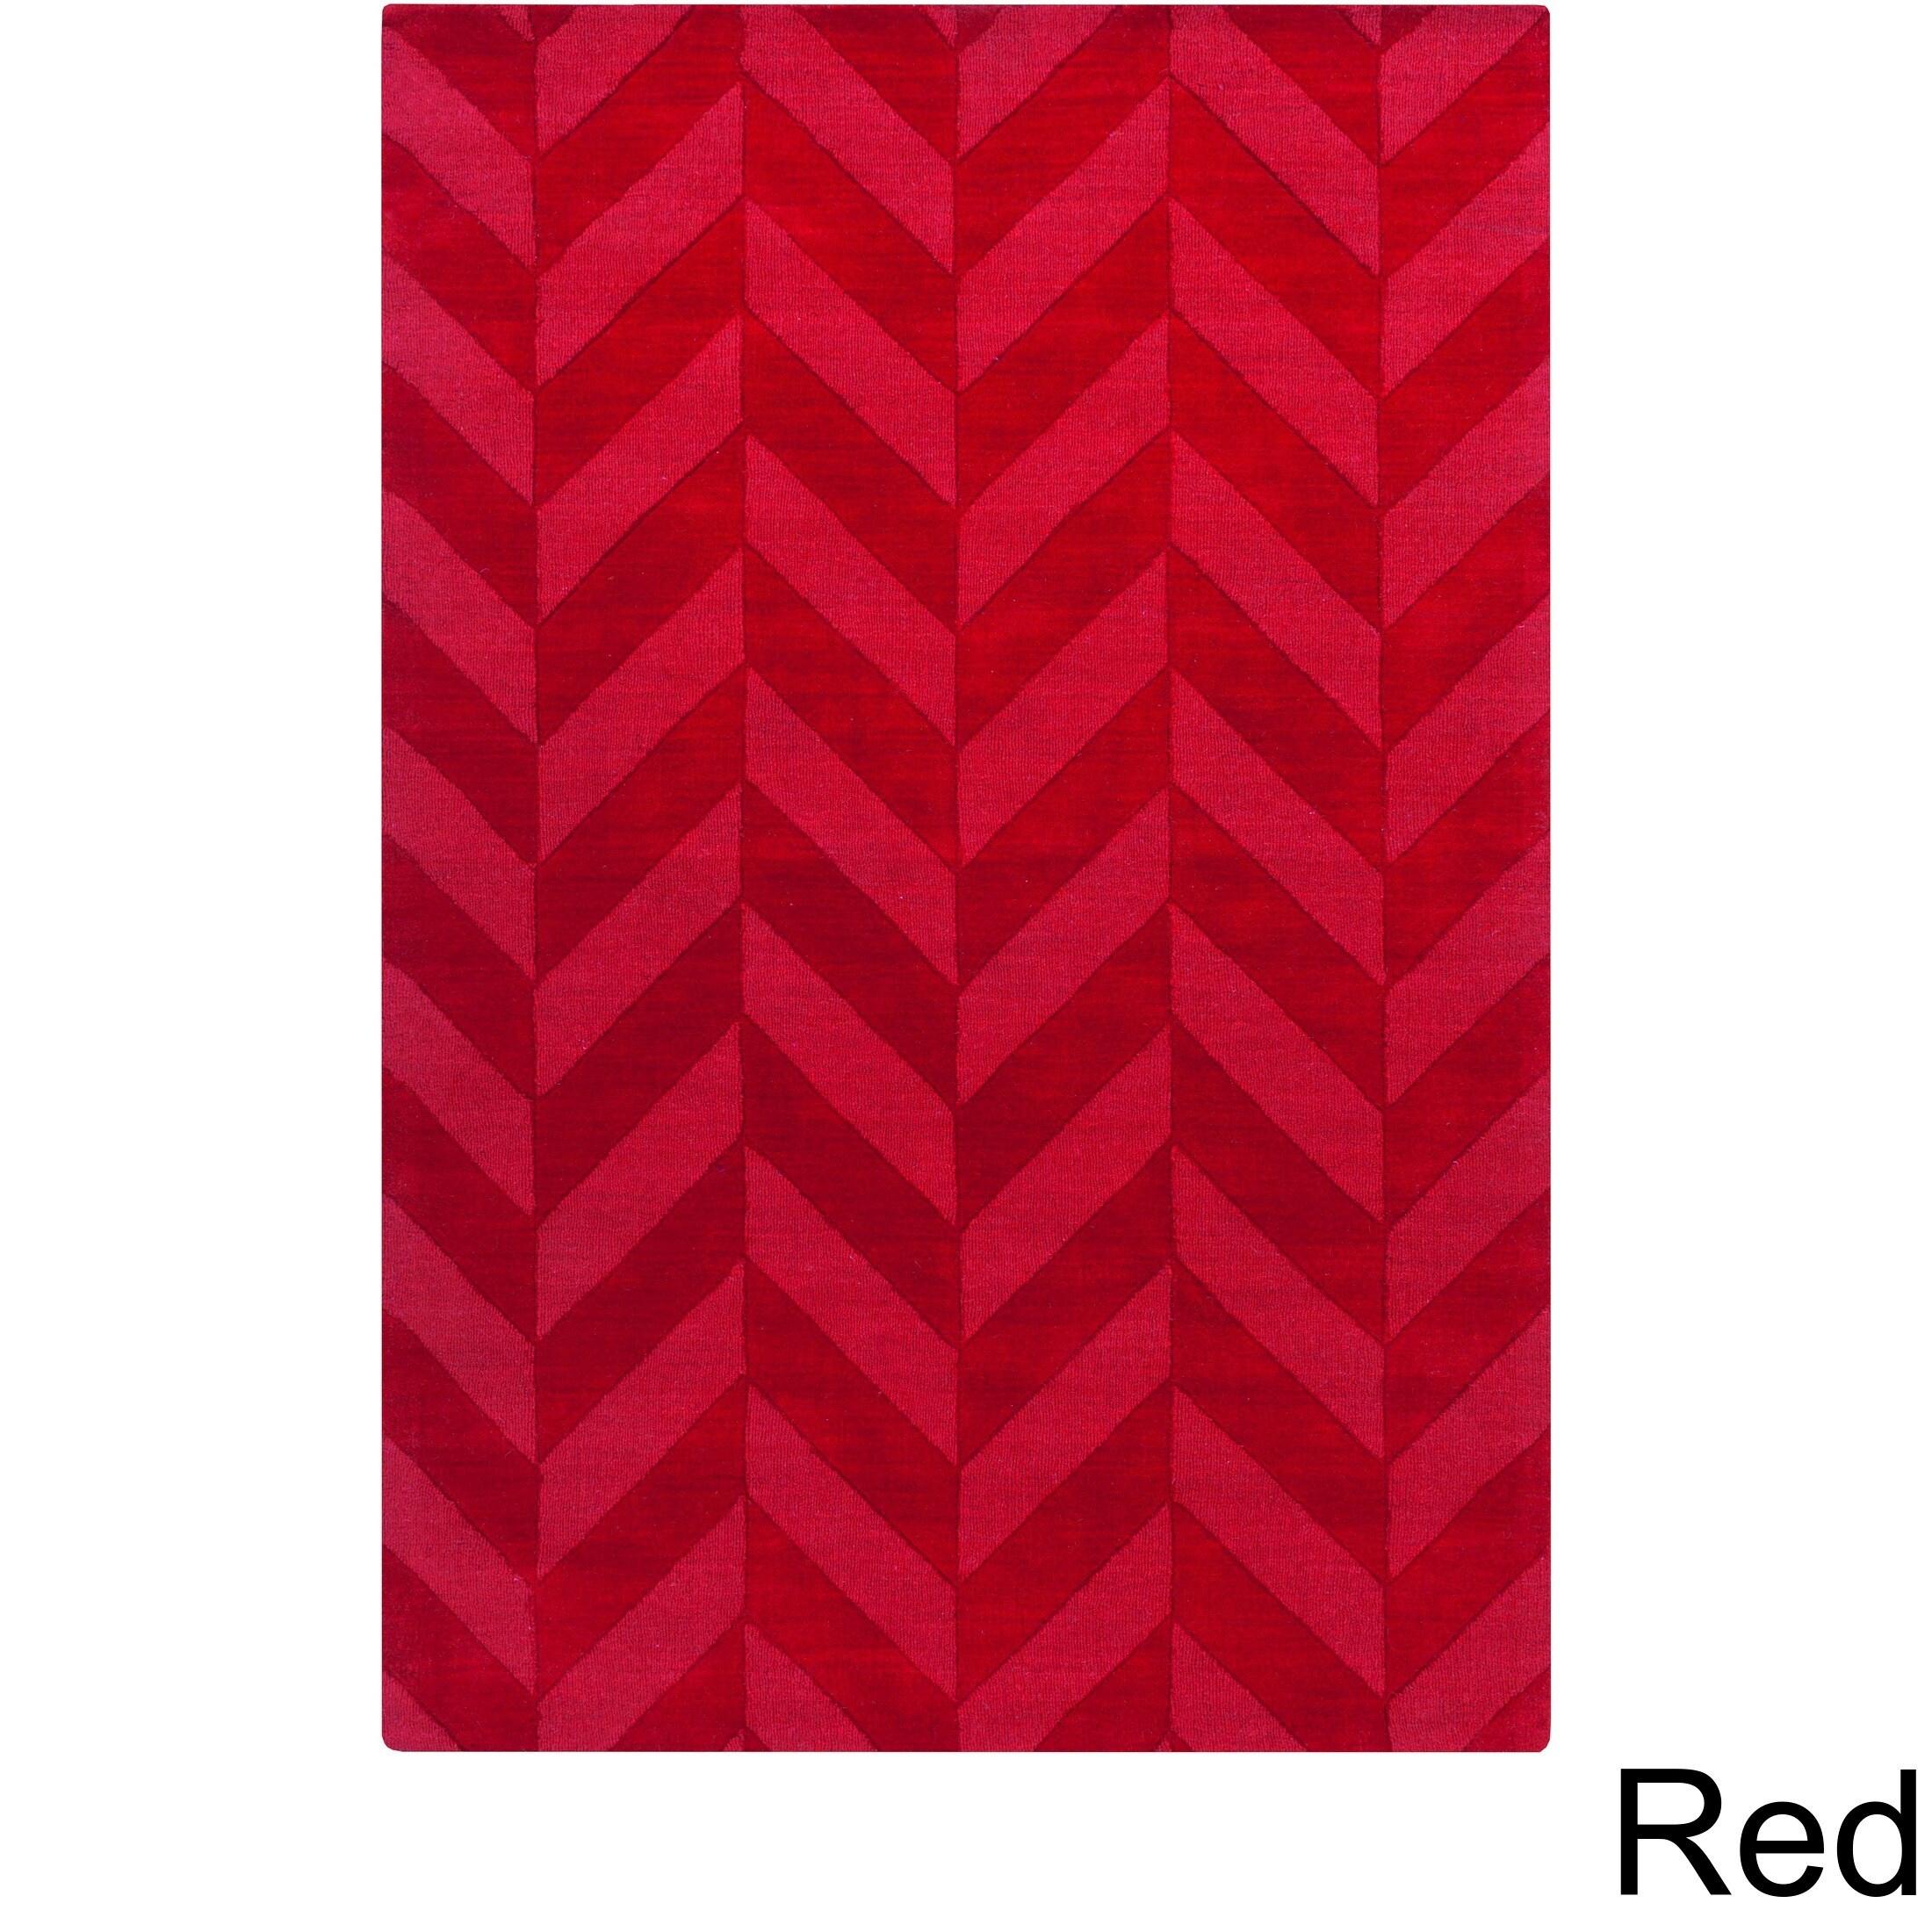 Artistic Weavers Hand-woven Ann Tone-on-Tone Geometric Zig-Zag Wool Area Rug (3' x 5') at Sears.com